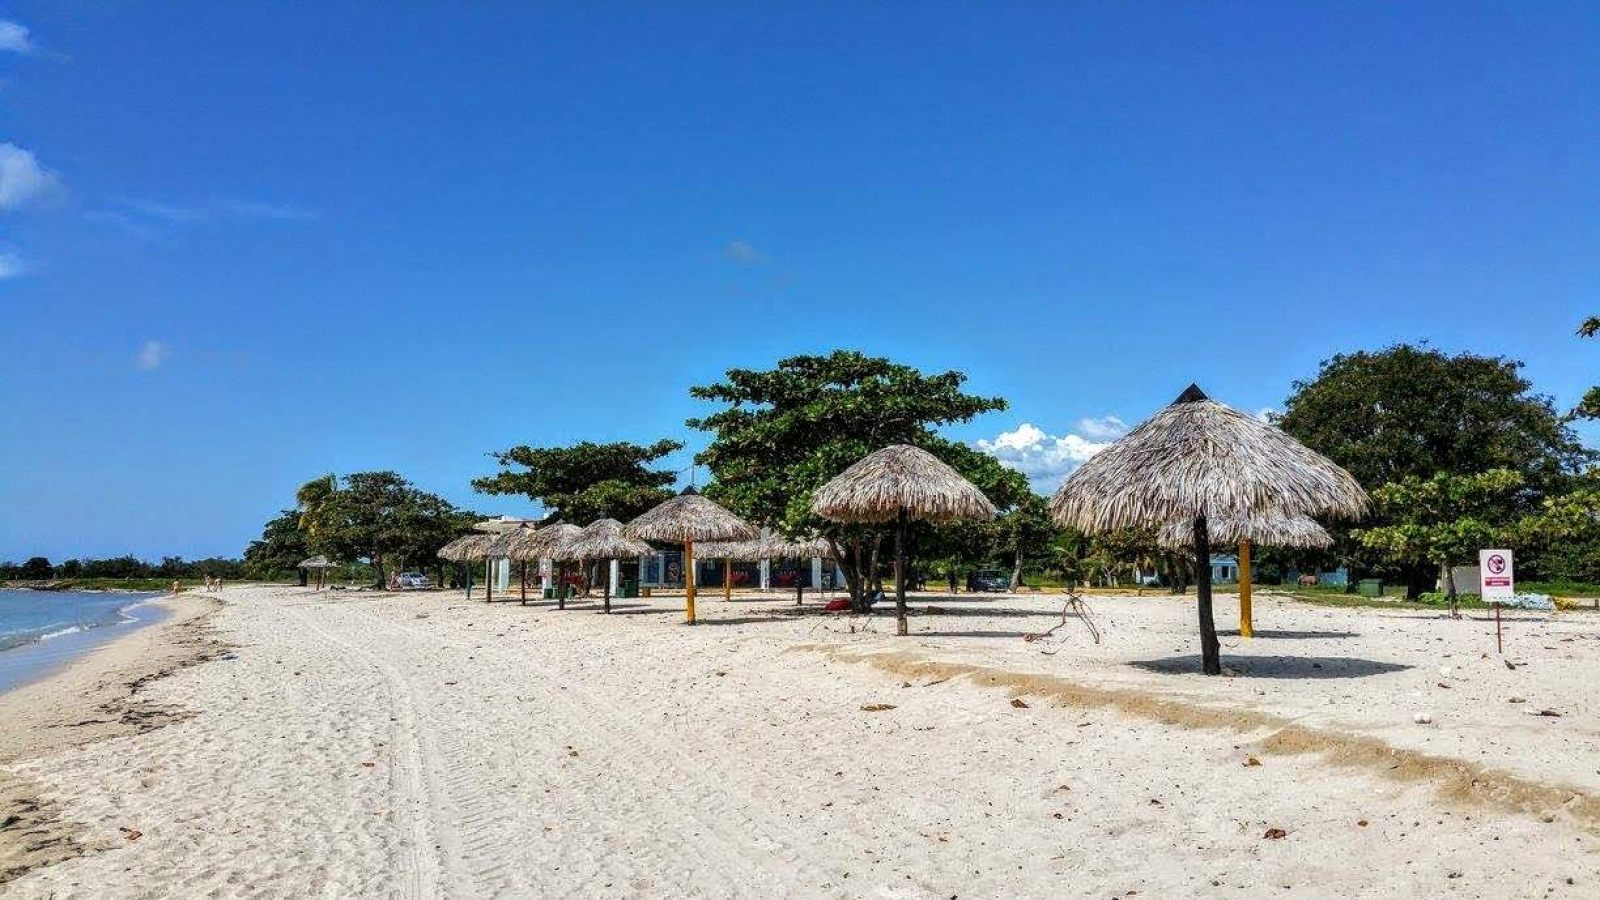 Hibiscus & Nomada : - - Playa Ancon, Cuba, Backpacking, Backpackers, Carib